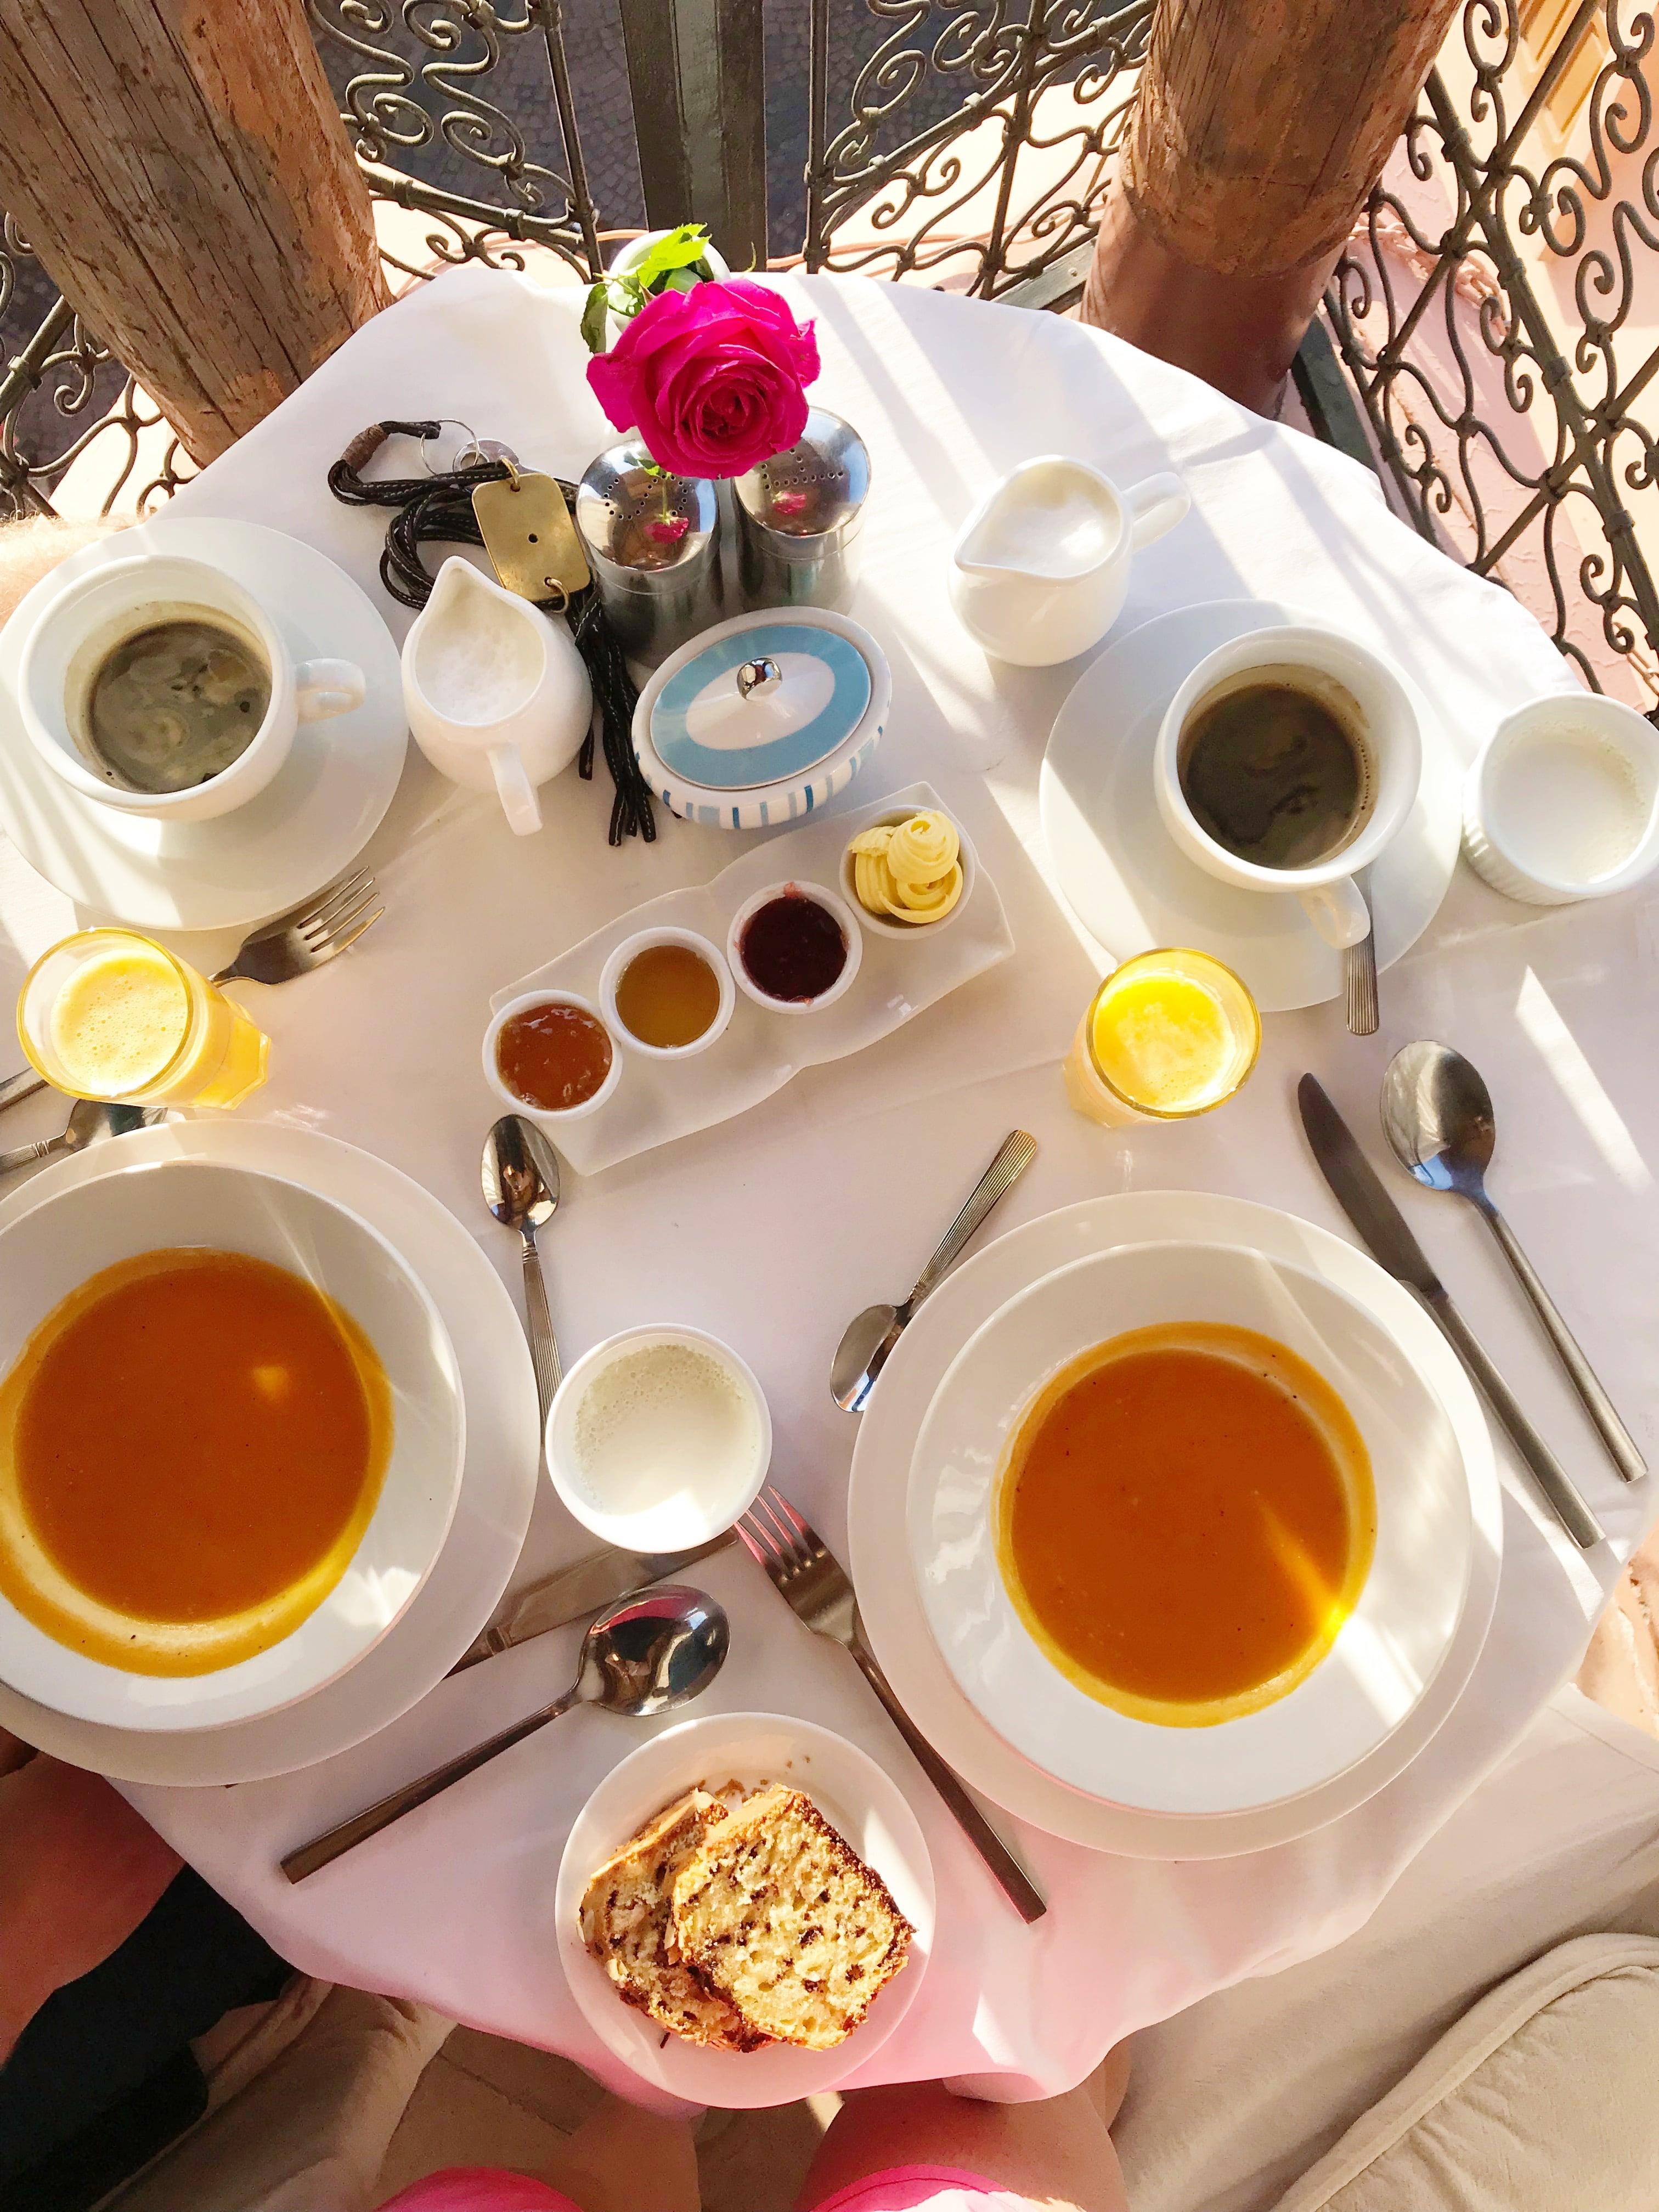 OUR STAY AT RIAD DAR ANIKA IN MARRAKECH | Riad Dar Anika - Dar Anika Marrakech - Riad Dar Anika Reviews - Riad Marrakech - Best Riads In Marrakech - Marrakech Riad - Riads In Marrakech - Riad Review - Where To Stay In Marrakech - Best Riads Morocco - #morocco #marrakech #travelblog